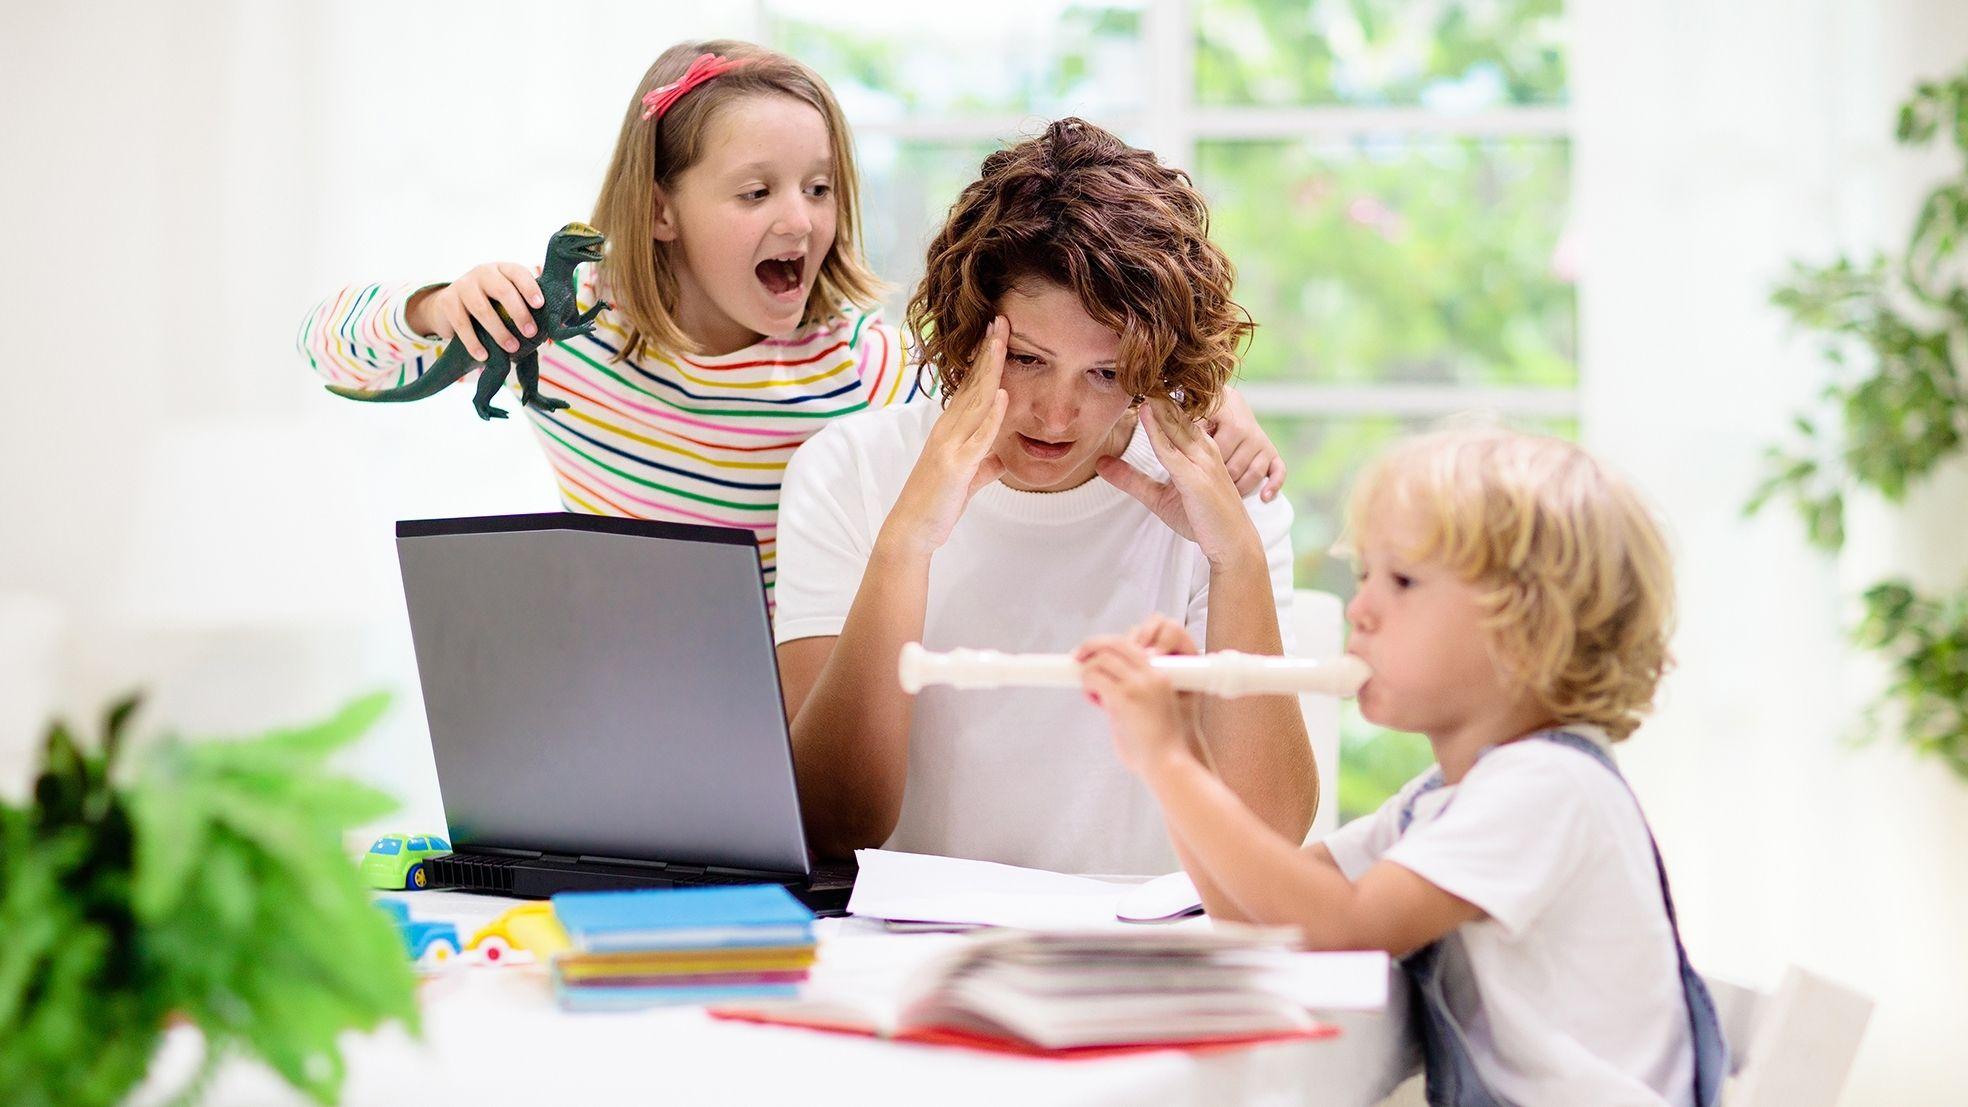 Thuiswerk vervelende kinderen moeder